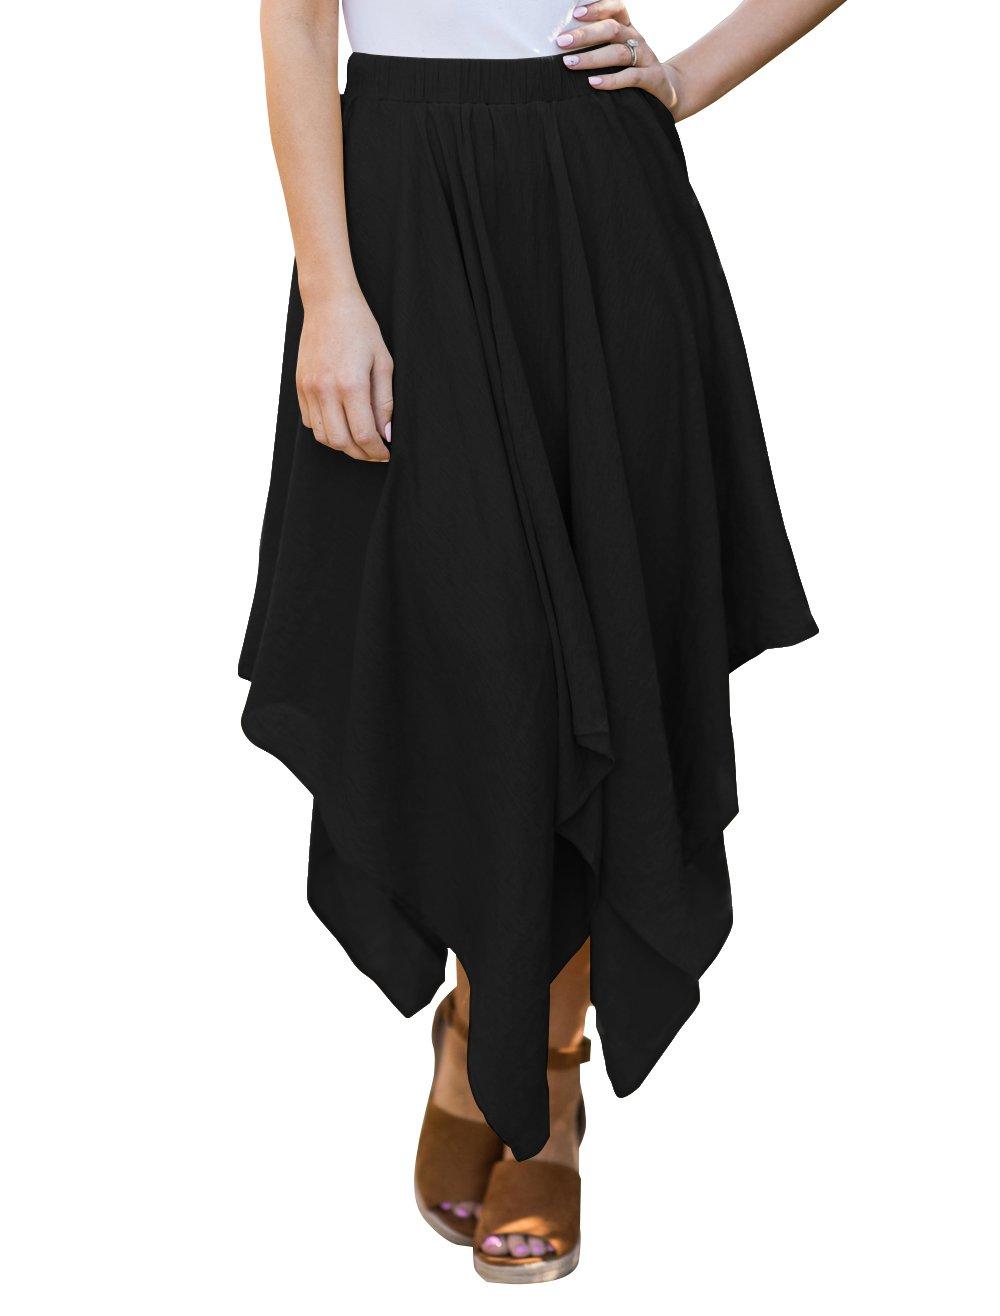 PRETTODAY Women's Flow Handkerchief Hemline Midi Skirts (XX-Large, Black)